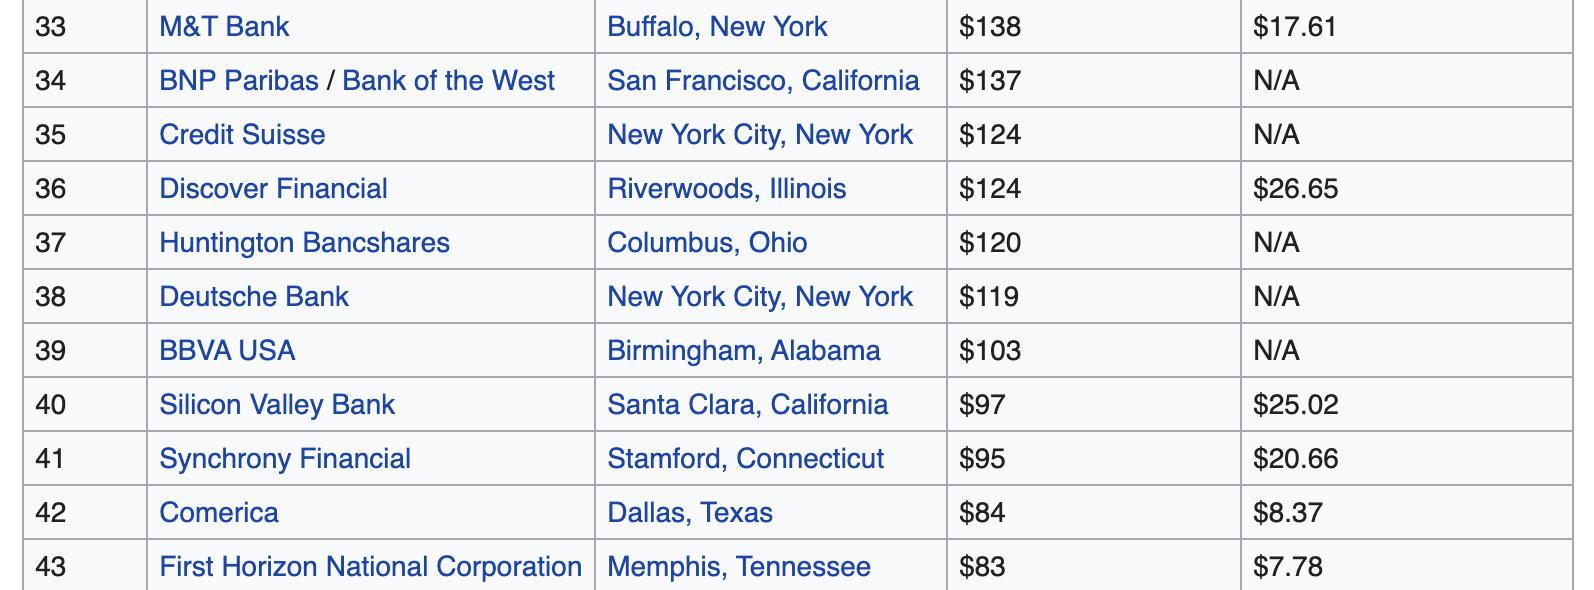 DeFi总锁仓价值突破1000亿美元,相当于美国第40大银行